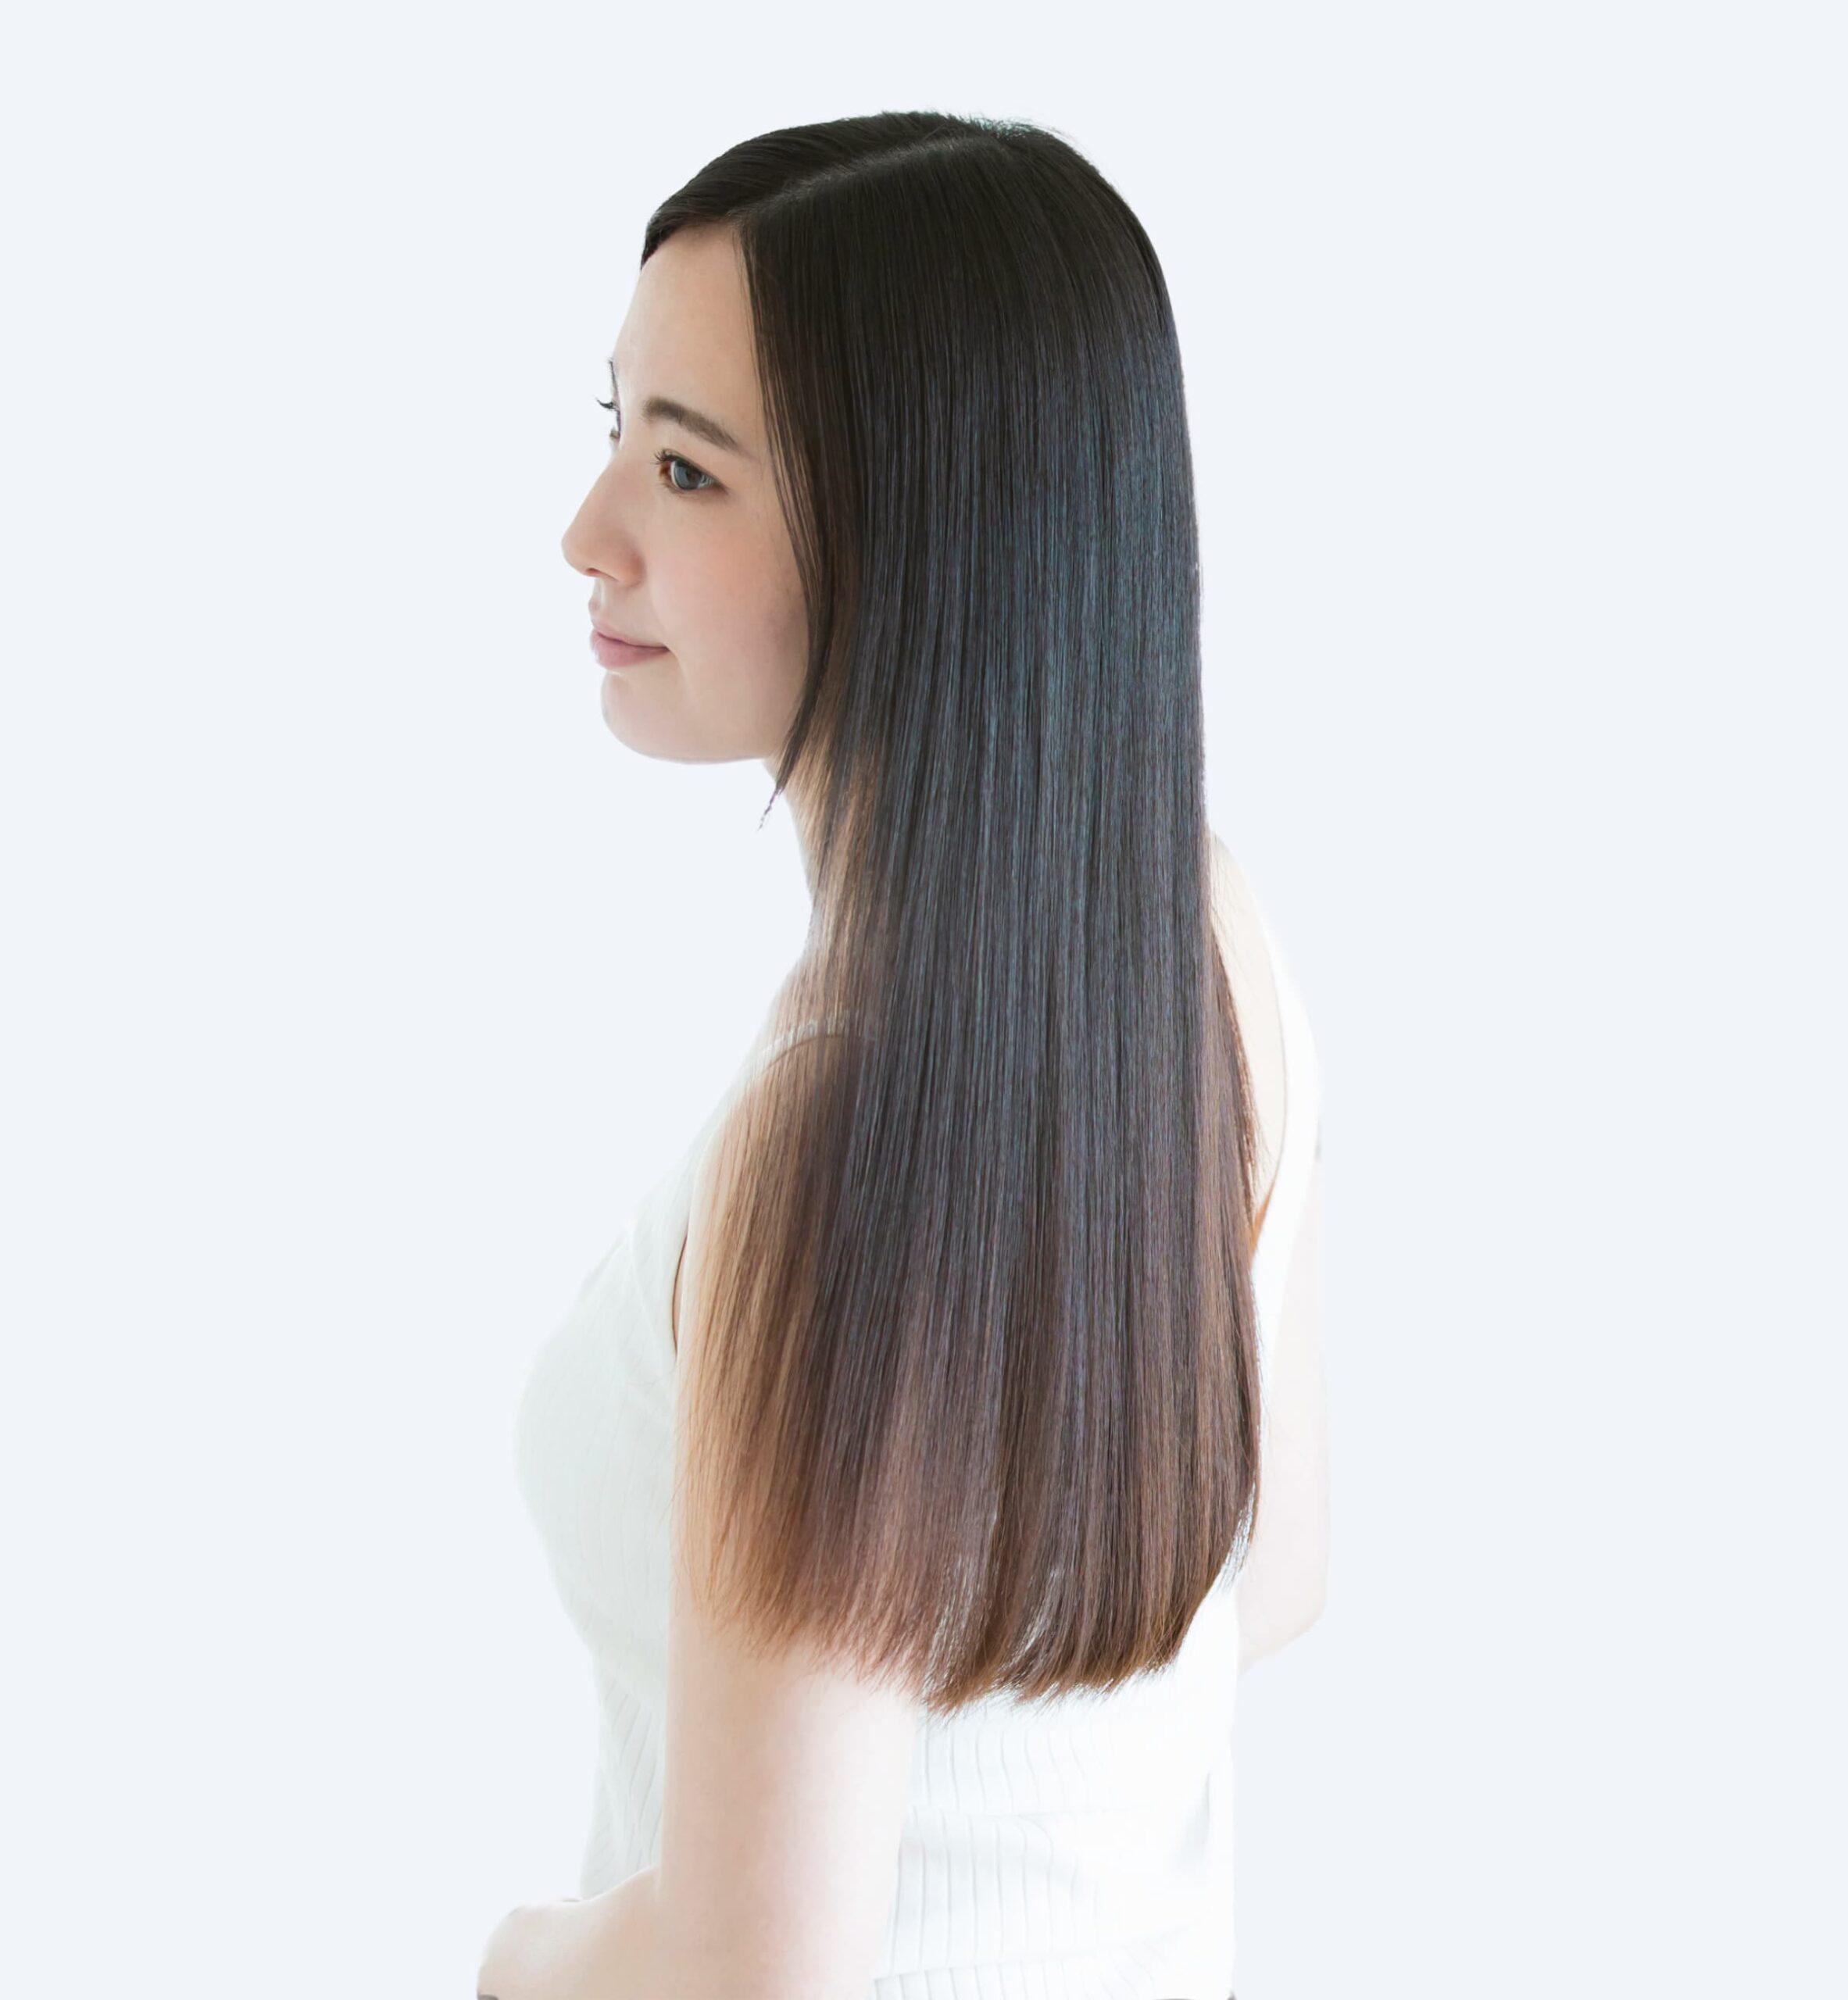 髪質改善美髪縮毛矯正エステ